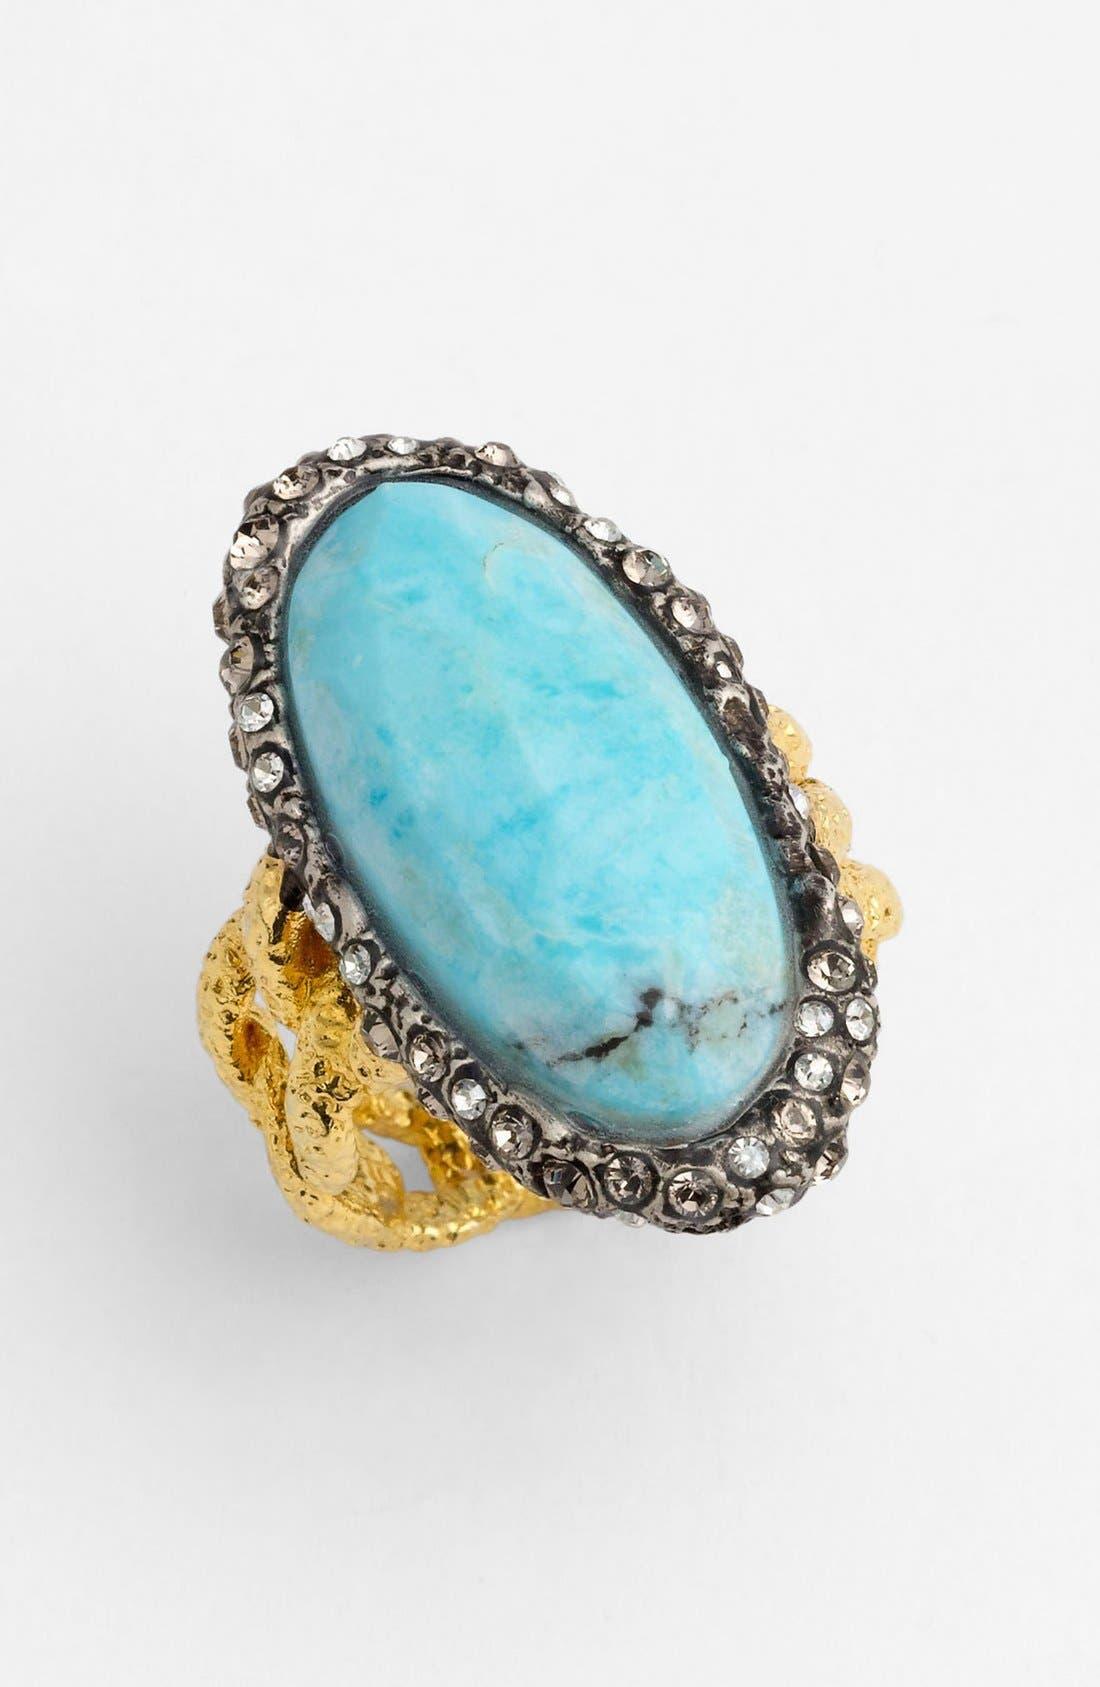 Main Image - Alexis Bittar 'Elements - Cordova' Stone Ring